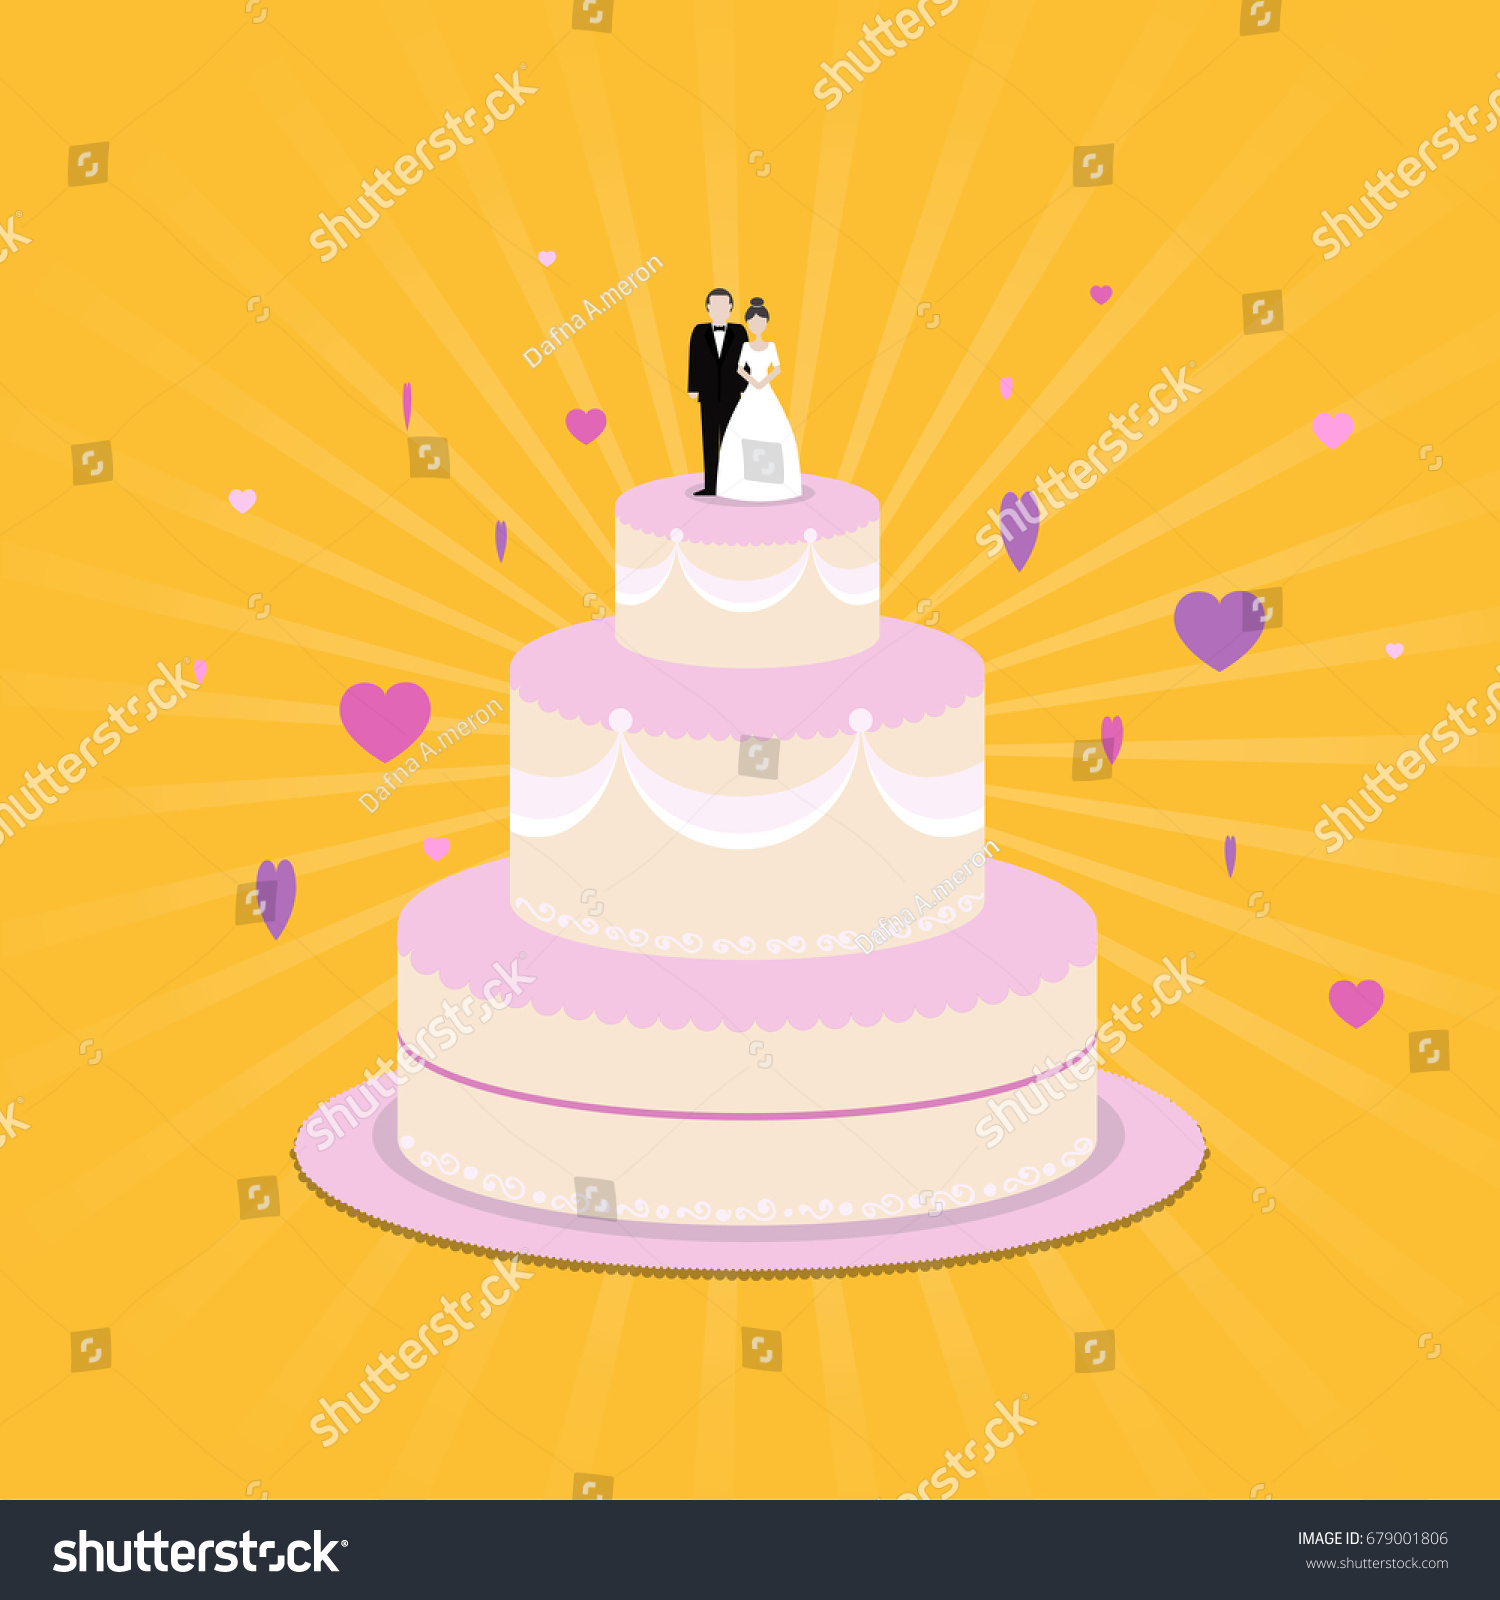 Wedding Cake Icon Stock Vector 679001806 - Shutterstock